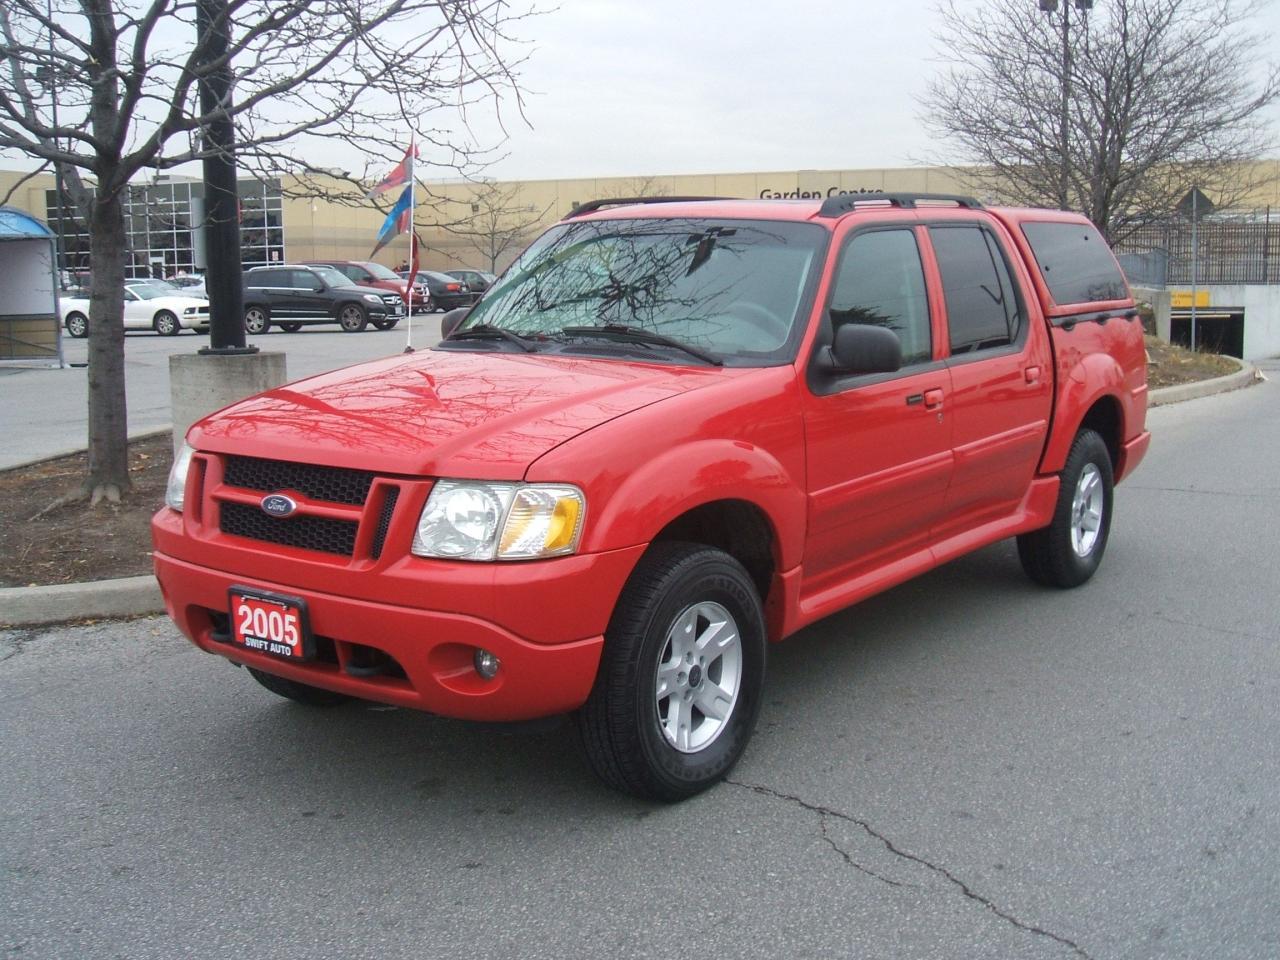 2005 Ford Explorer Sport Trac XLT 4X4